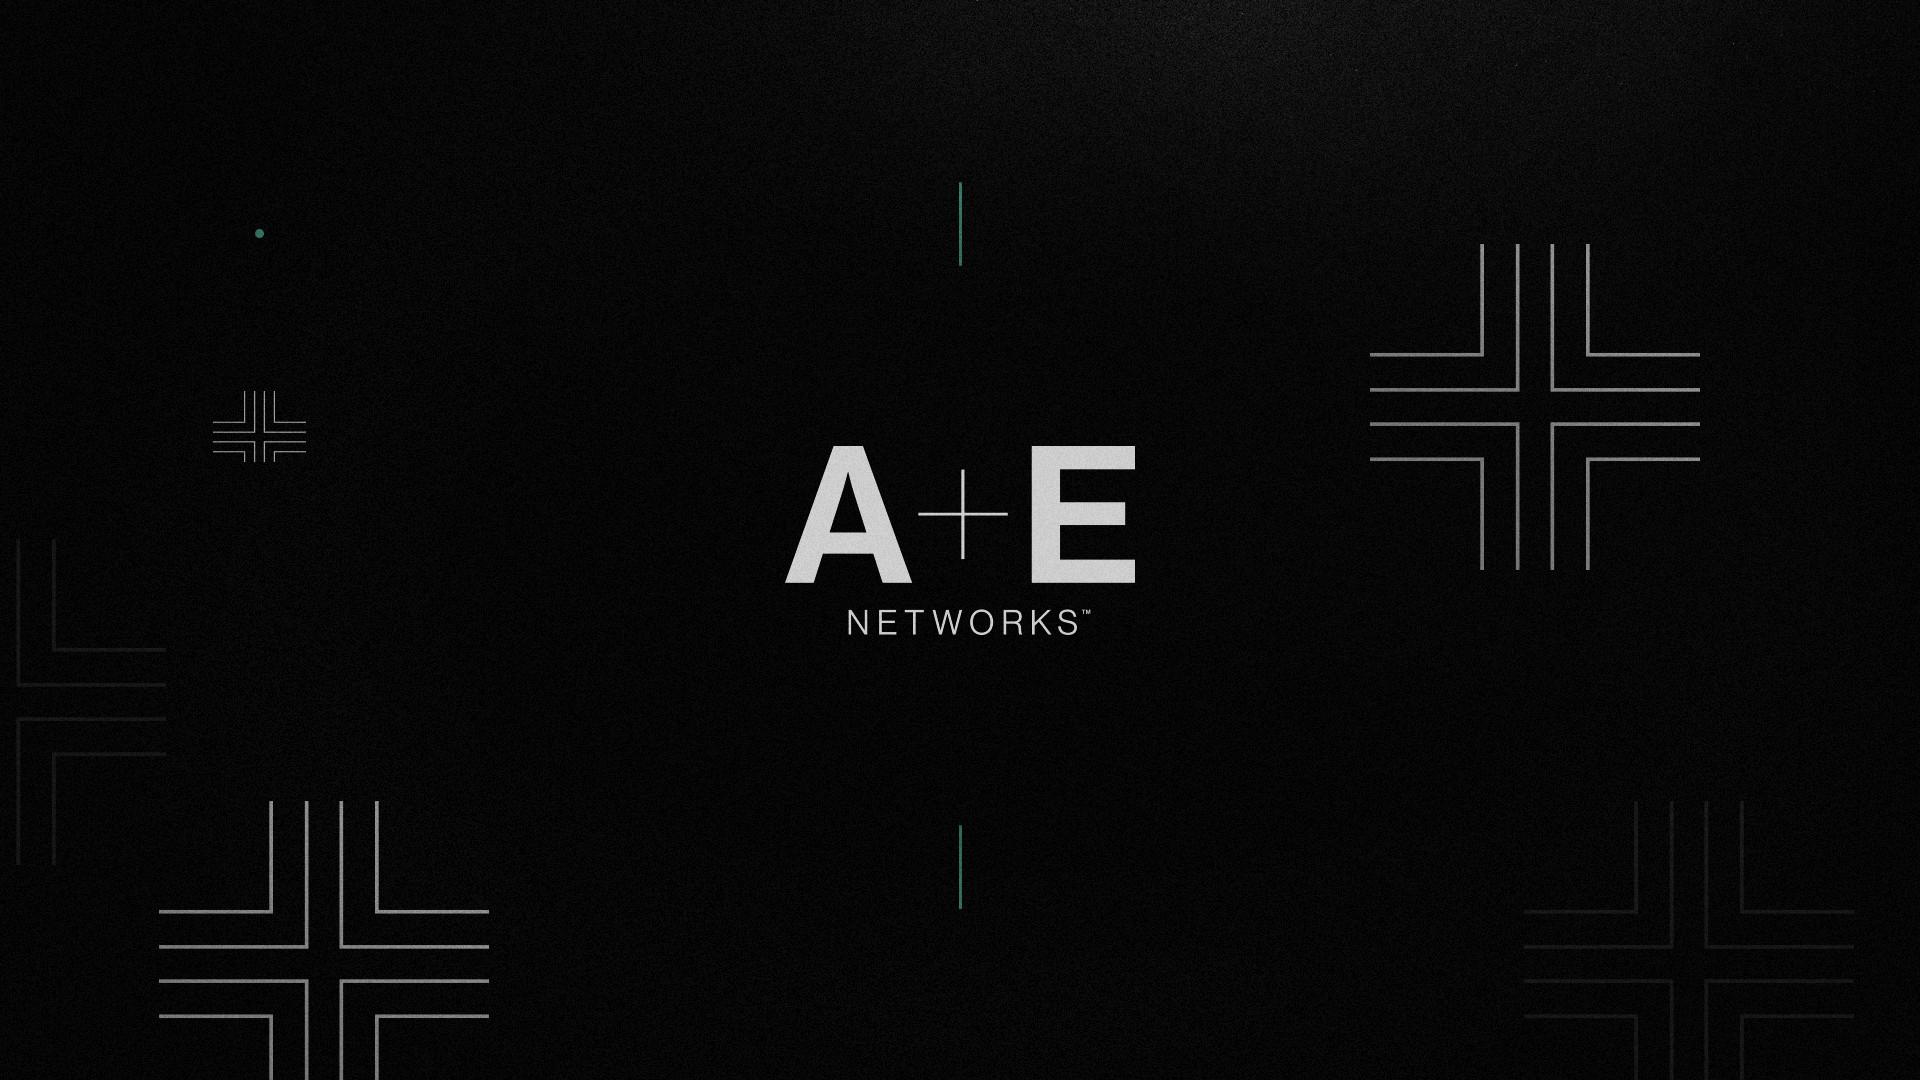 A+E_Upfront_AE_02_transition.jpg